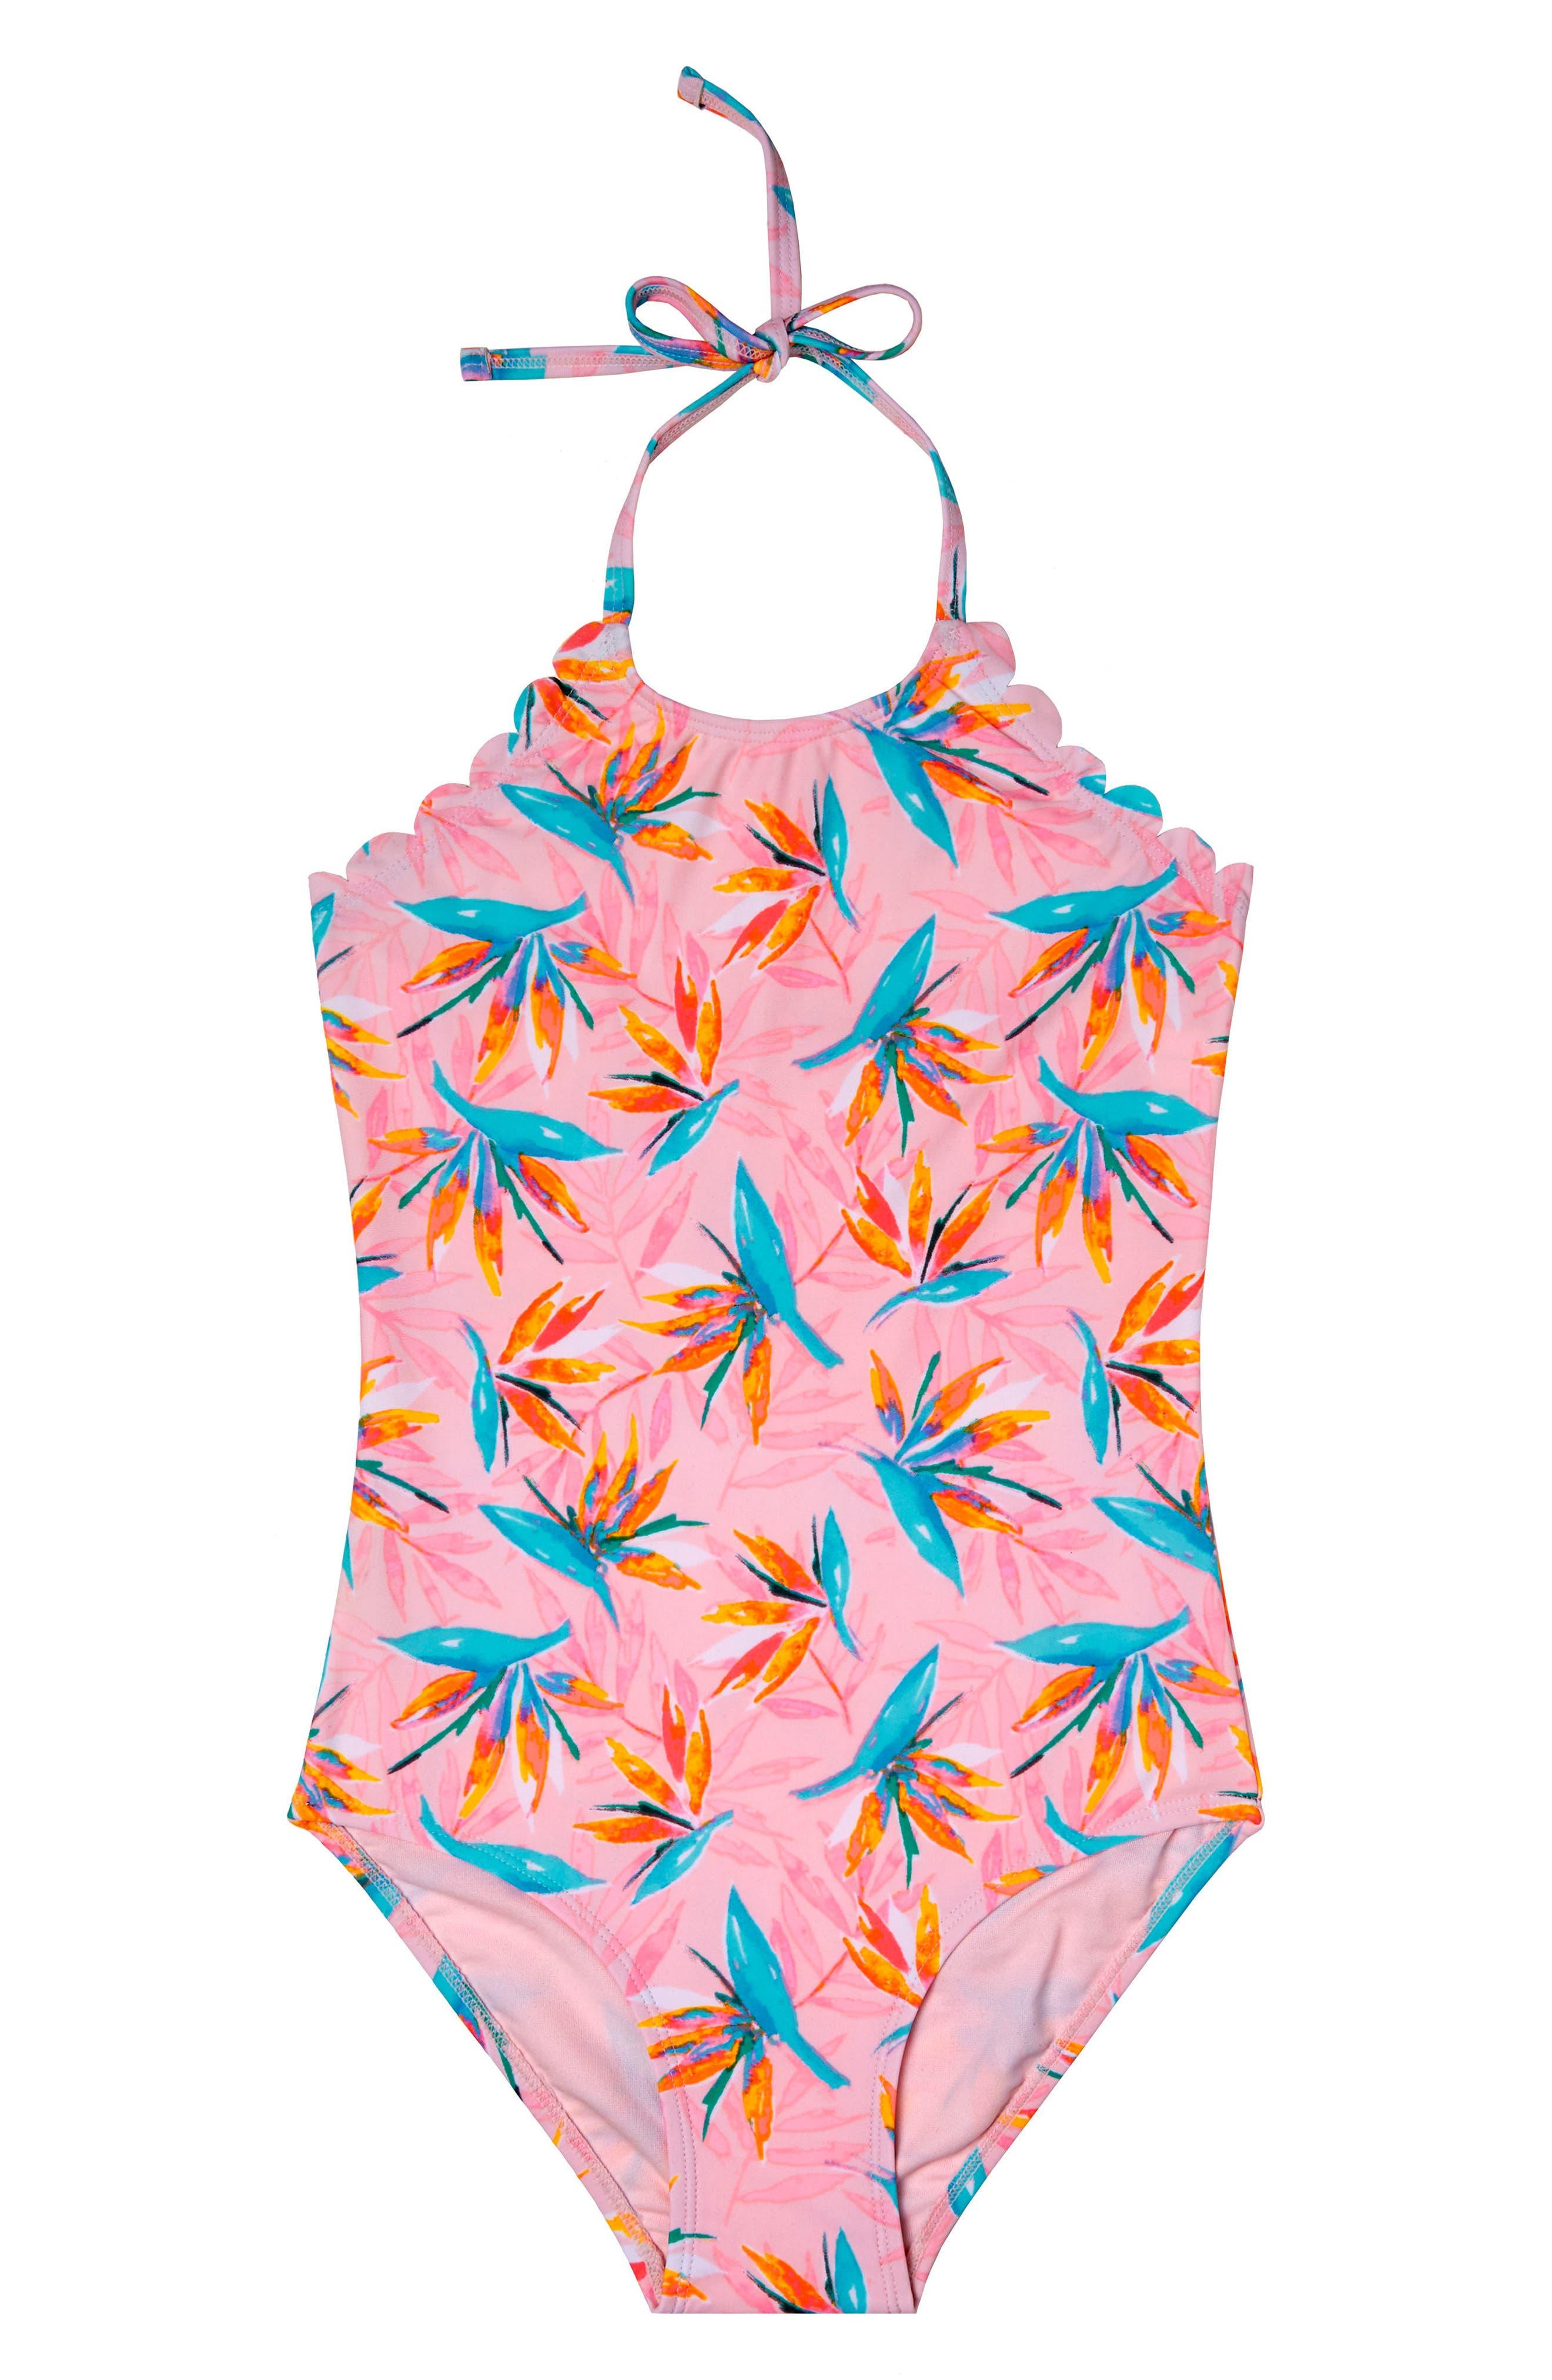 Paradise Haven One-Piece Swimsuit,                         Main,                         color, Pink